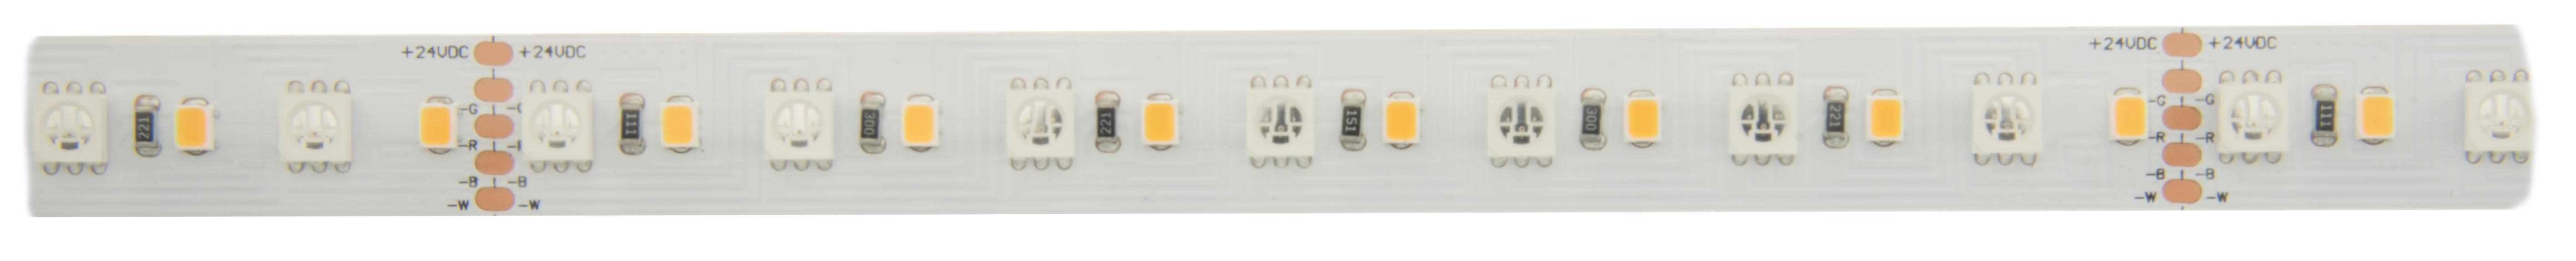 1 Stk Flexstrip 115 RGB-NW Ra=90+ 14W/m 1170lm/m, 24VDC IP44, l=5m LIFS009305